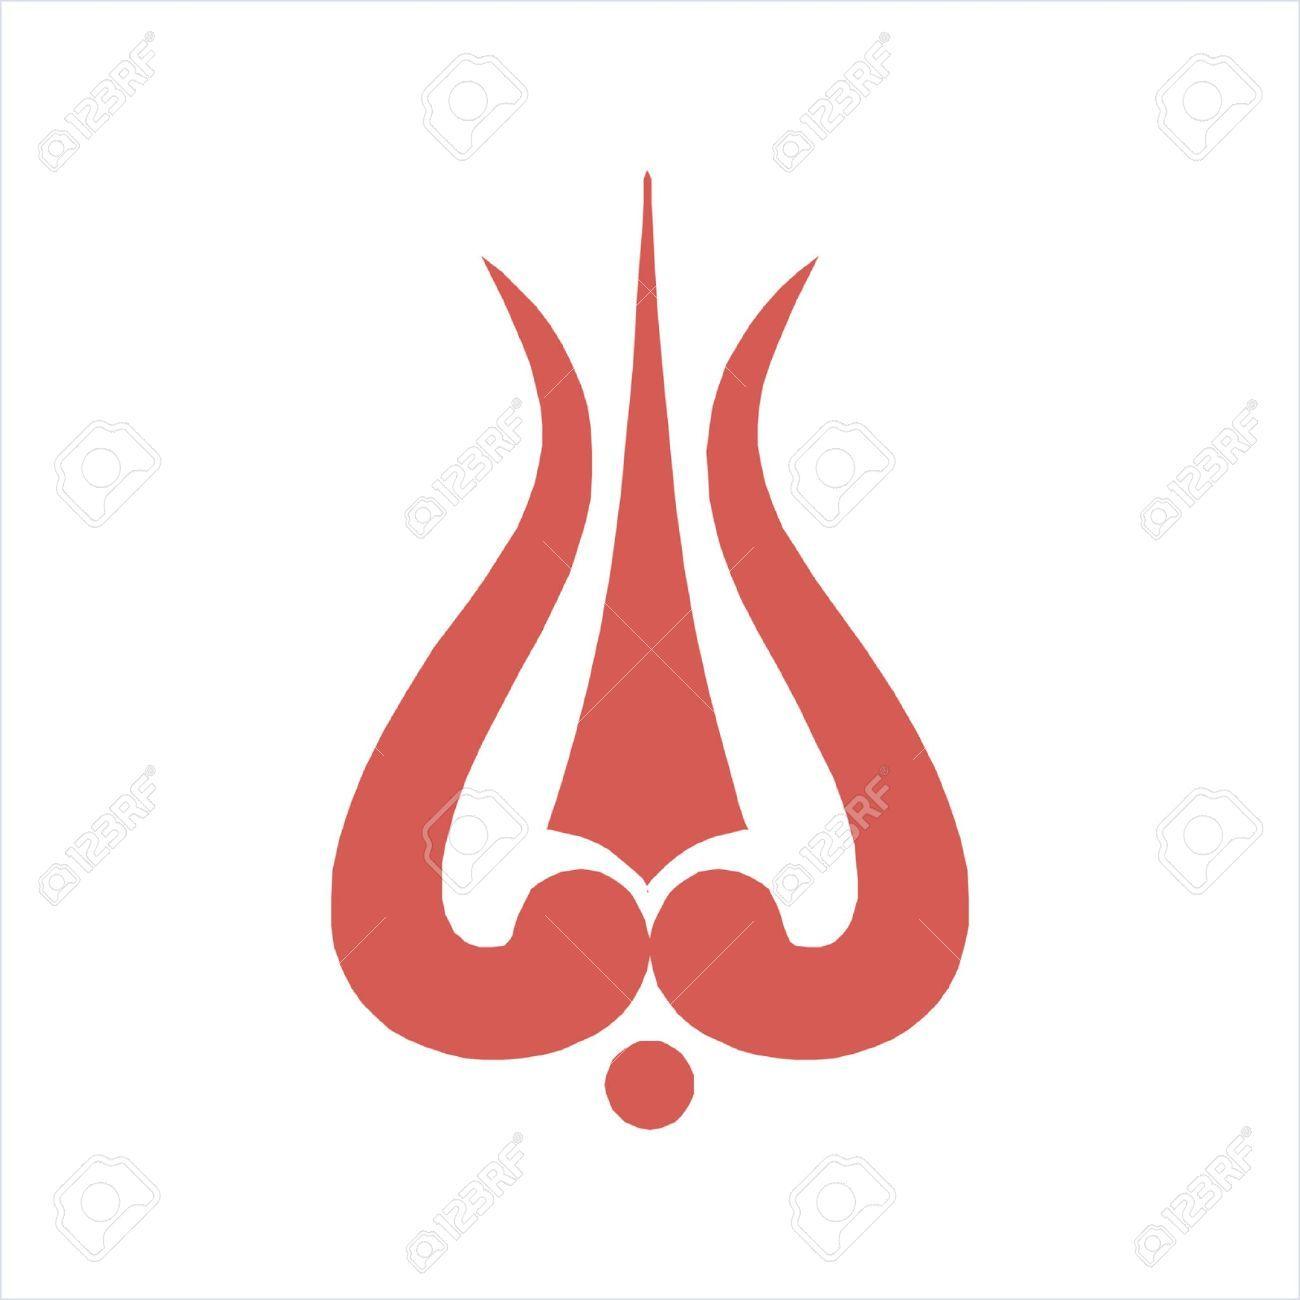 Clipart laxmi road jpg freeuse download Shiva Stock Vector Illustration And Royalty Free Shiva Clipart ... jpg freeuse download